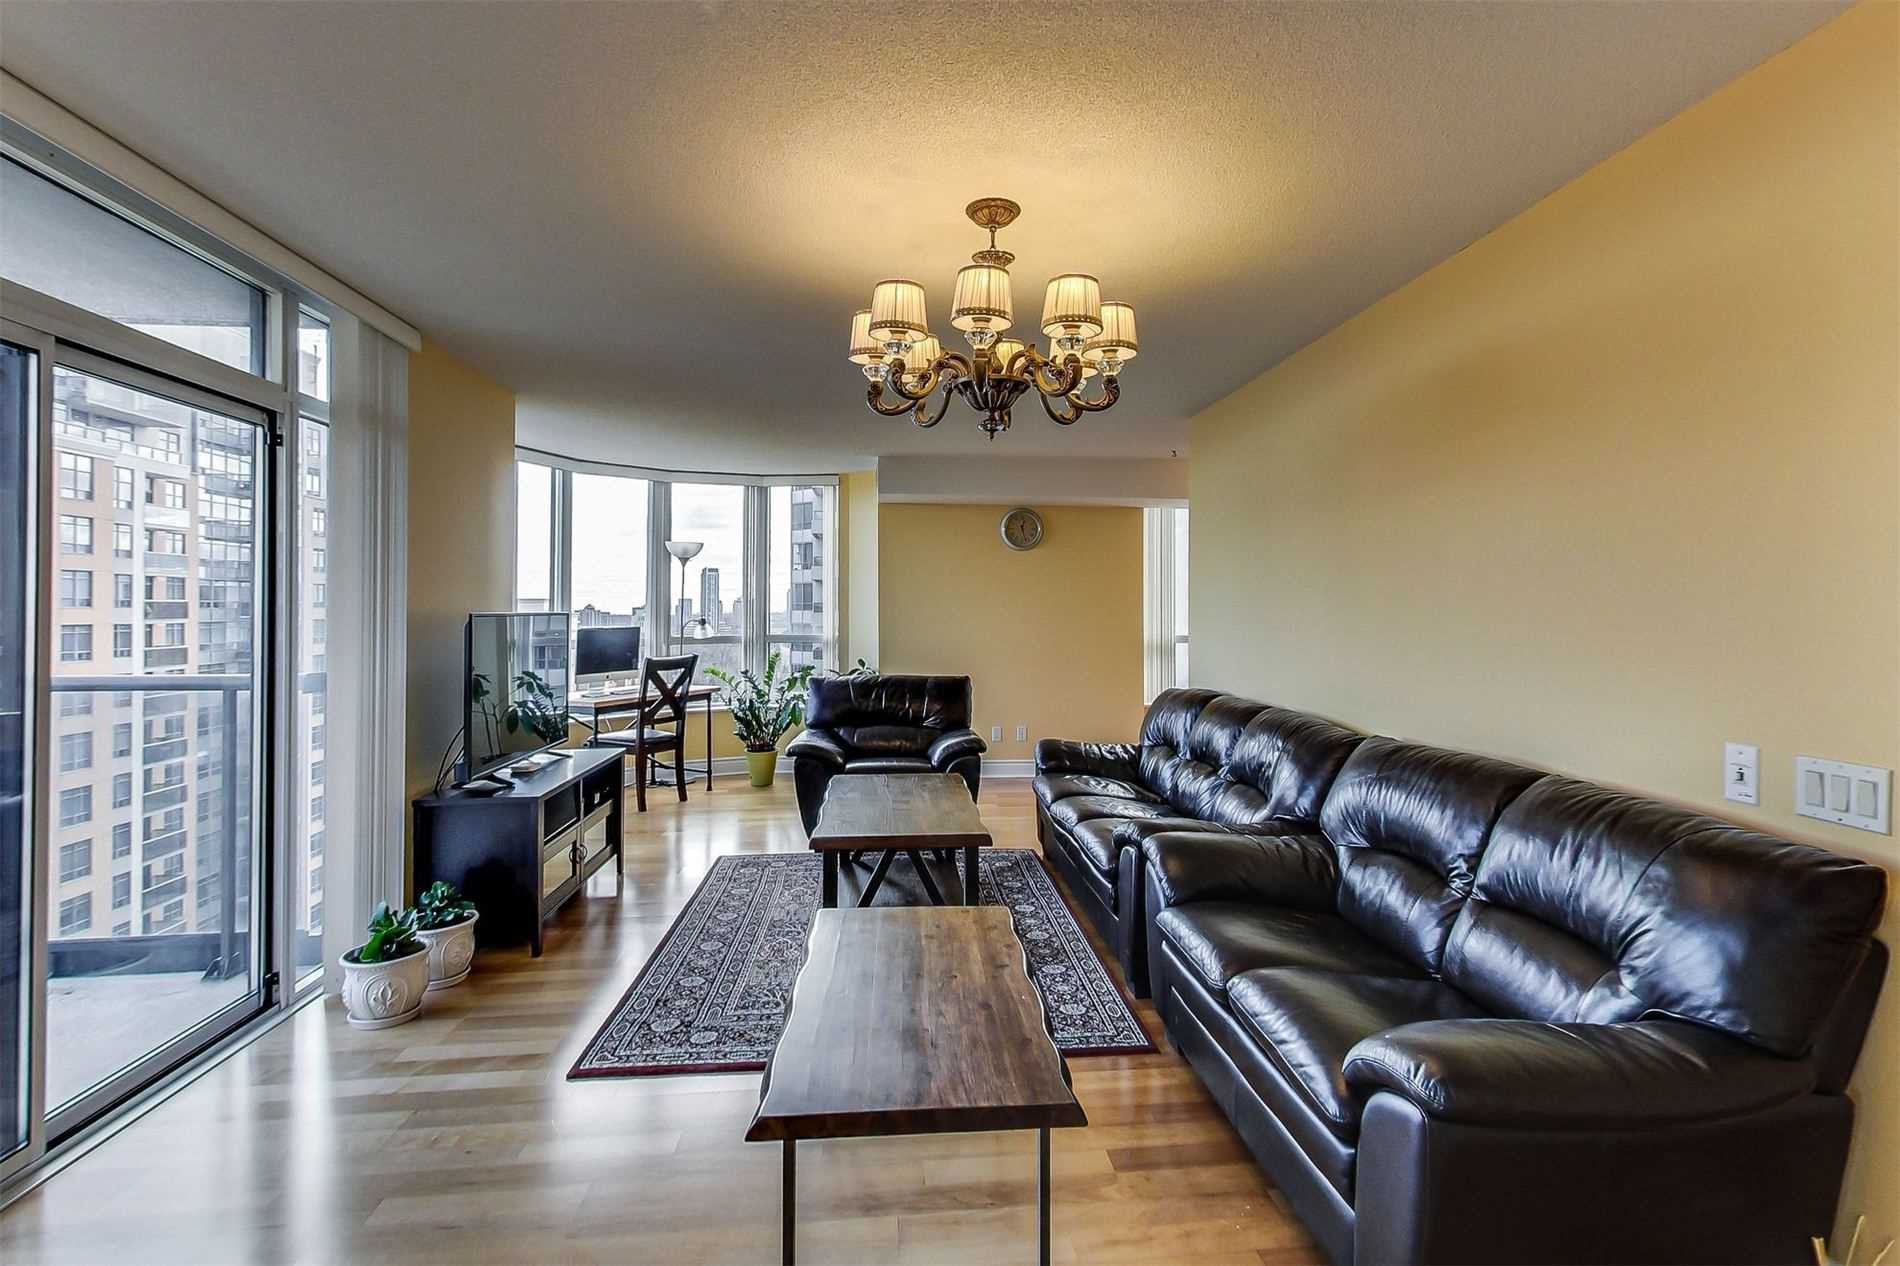 Photo 3: Photos: 1204 10 Northtown Way in Toronto: Willowdale East Condo for sale (Toronto C14)  : MLS®# C4648371